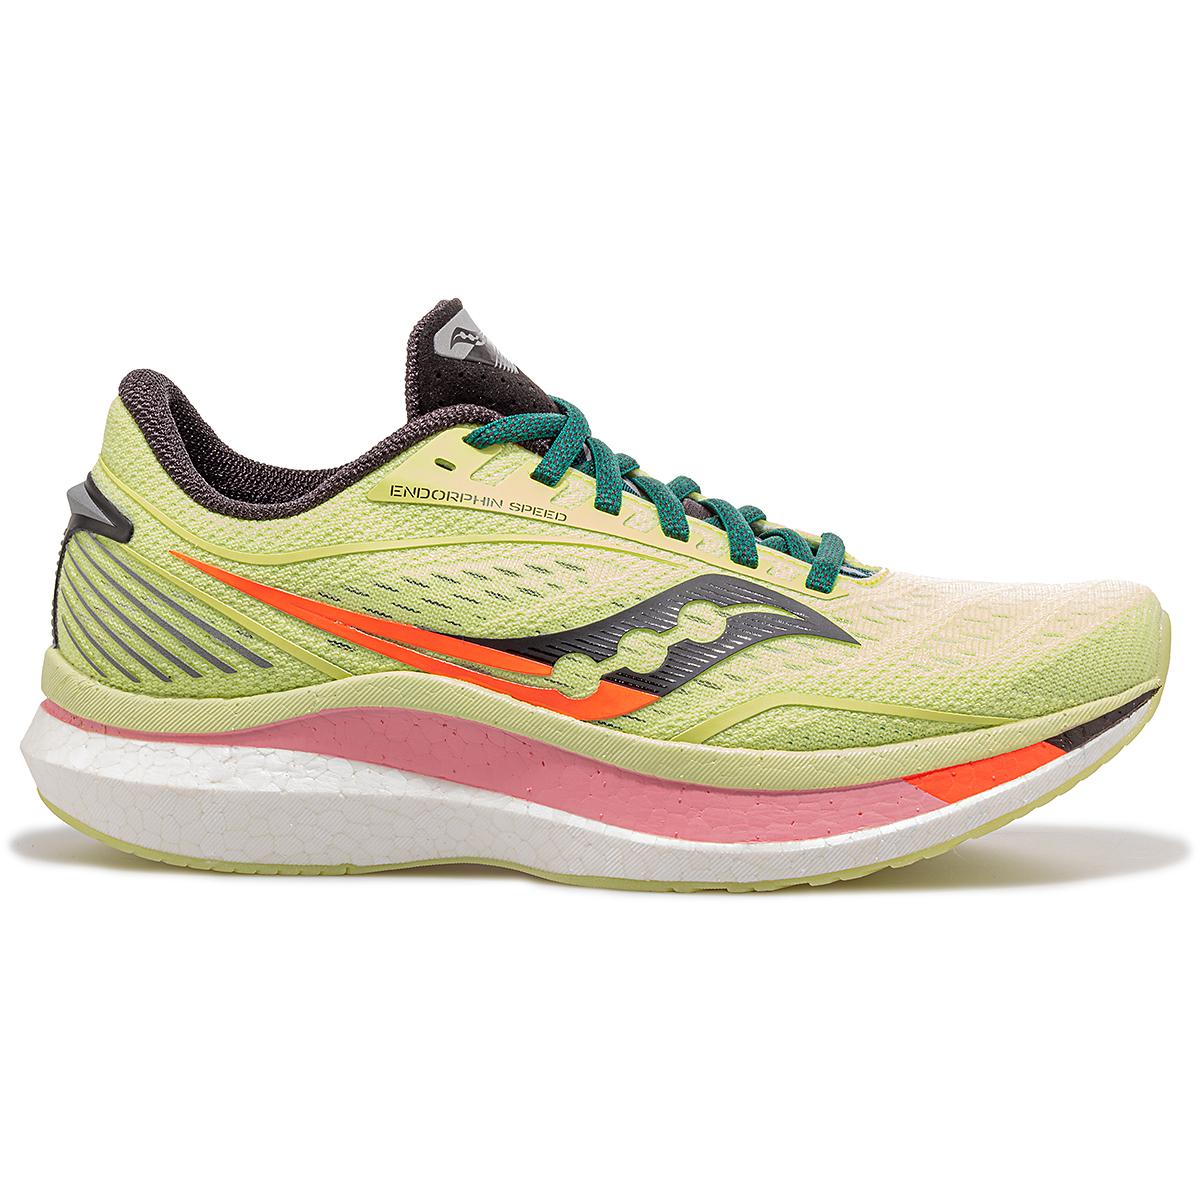 Women's Saucony Jackalope 2.0 Endorphin Speed Running Shoe - Color: Jackalope - Size: 5 - Width: Regular, Jackalope, large, image 1